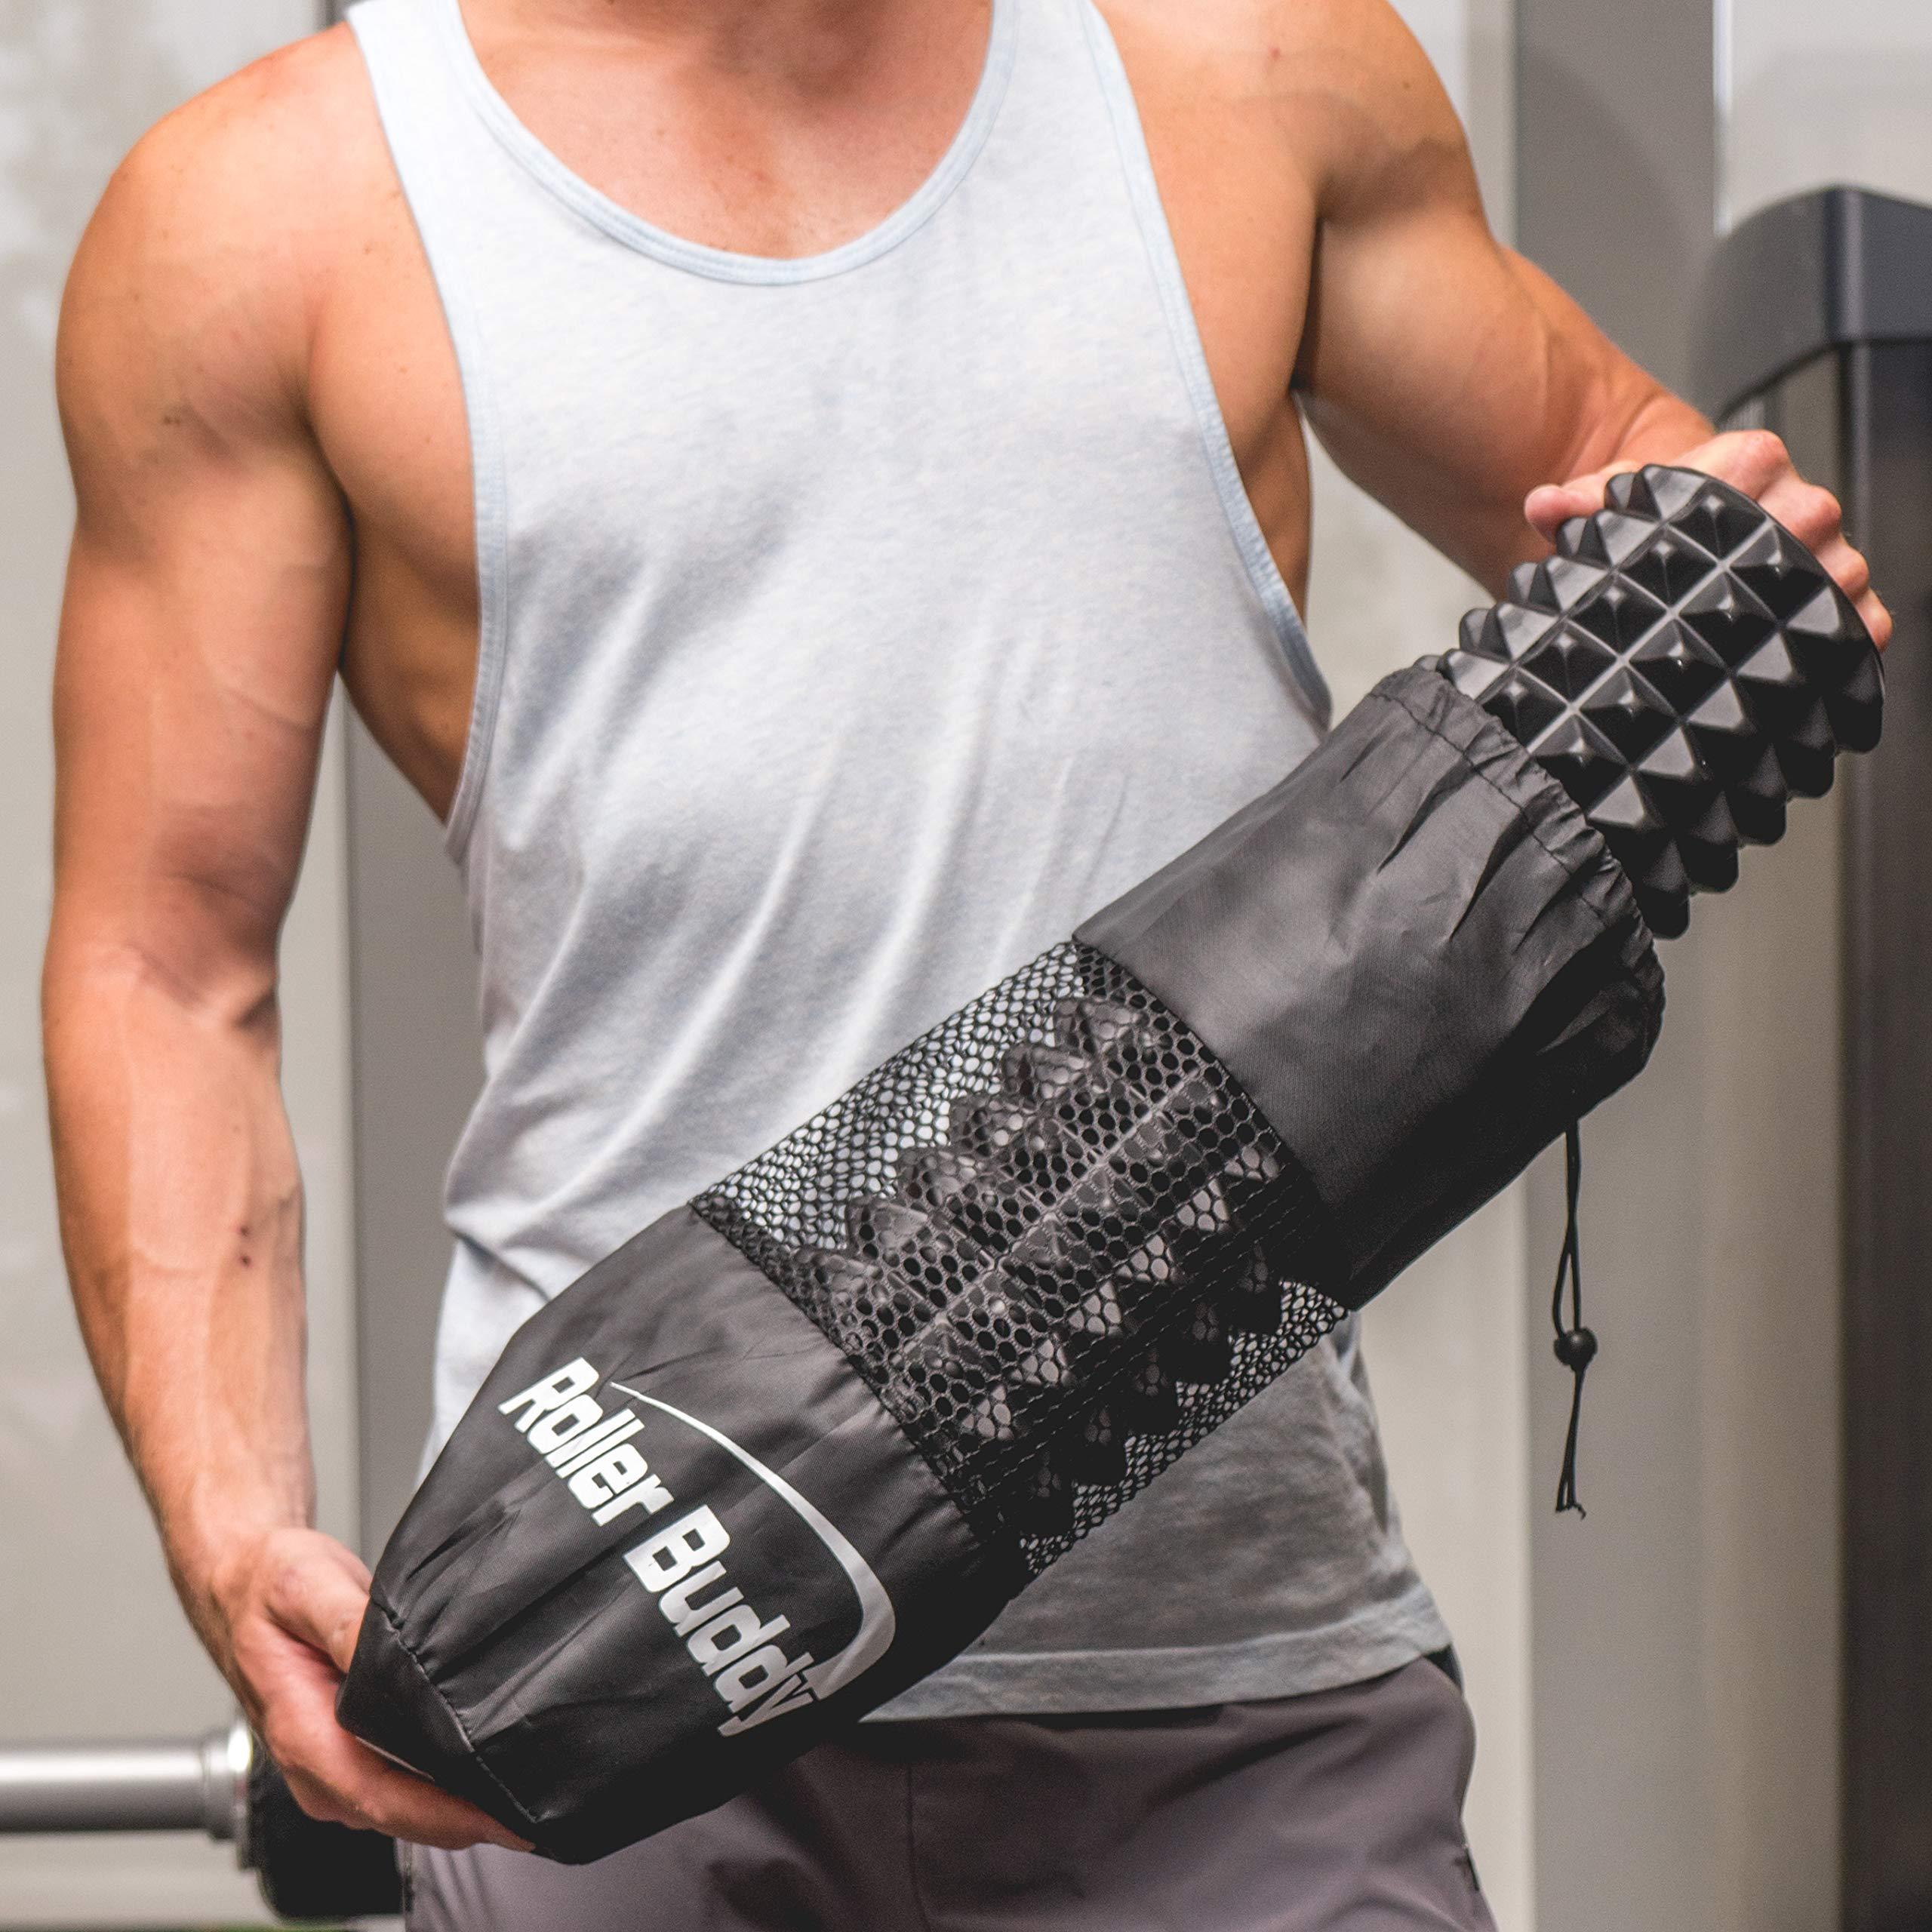 Muscle Massage Foam Roller Kit Back Massager Roller - 4 in 1 Best Trigger Point Massage Tool Lacrosse Roller Ball Massager Stick by Roller Buddy (Image #9)